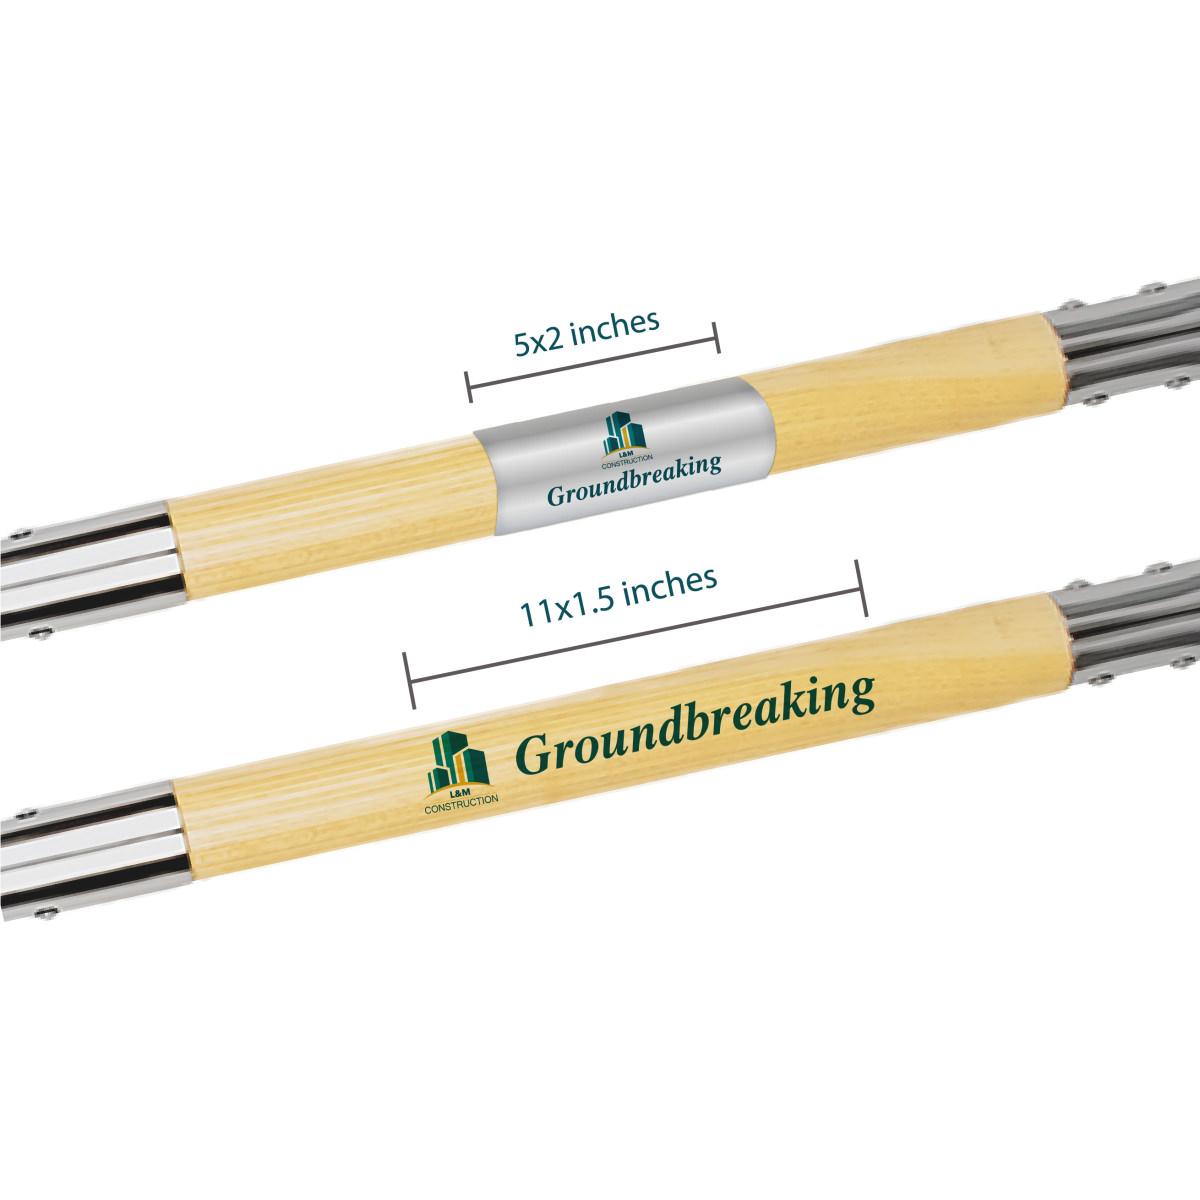 Chrome mirror groundbreaking shovel stem customization